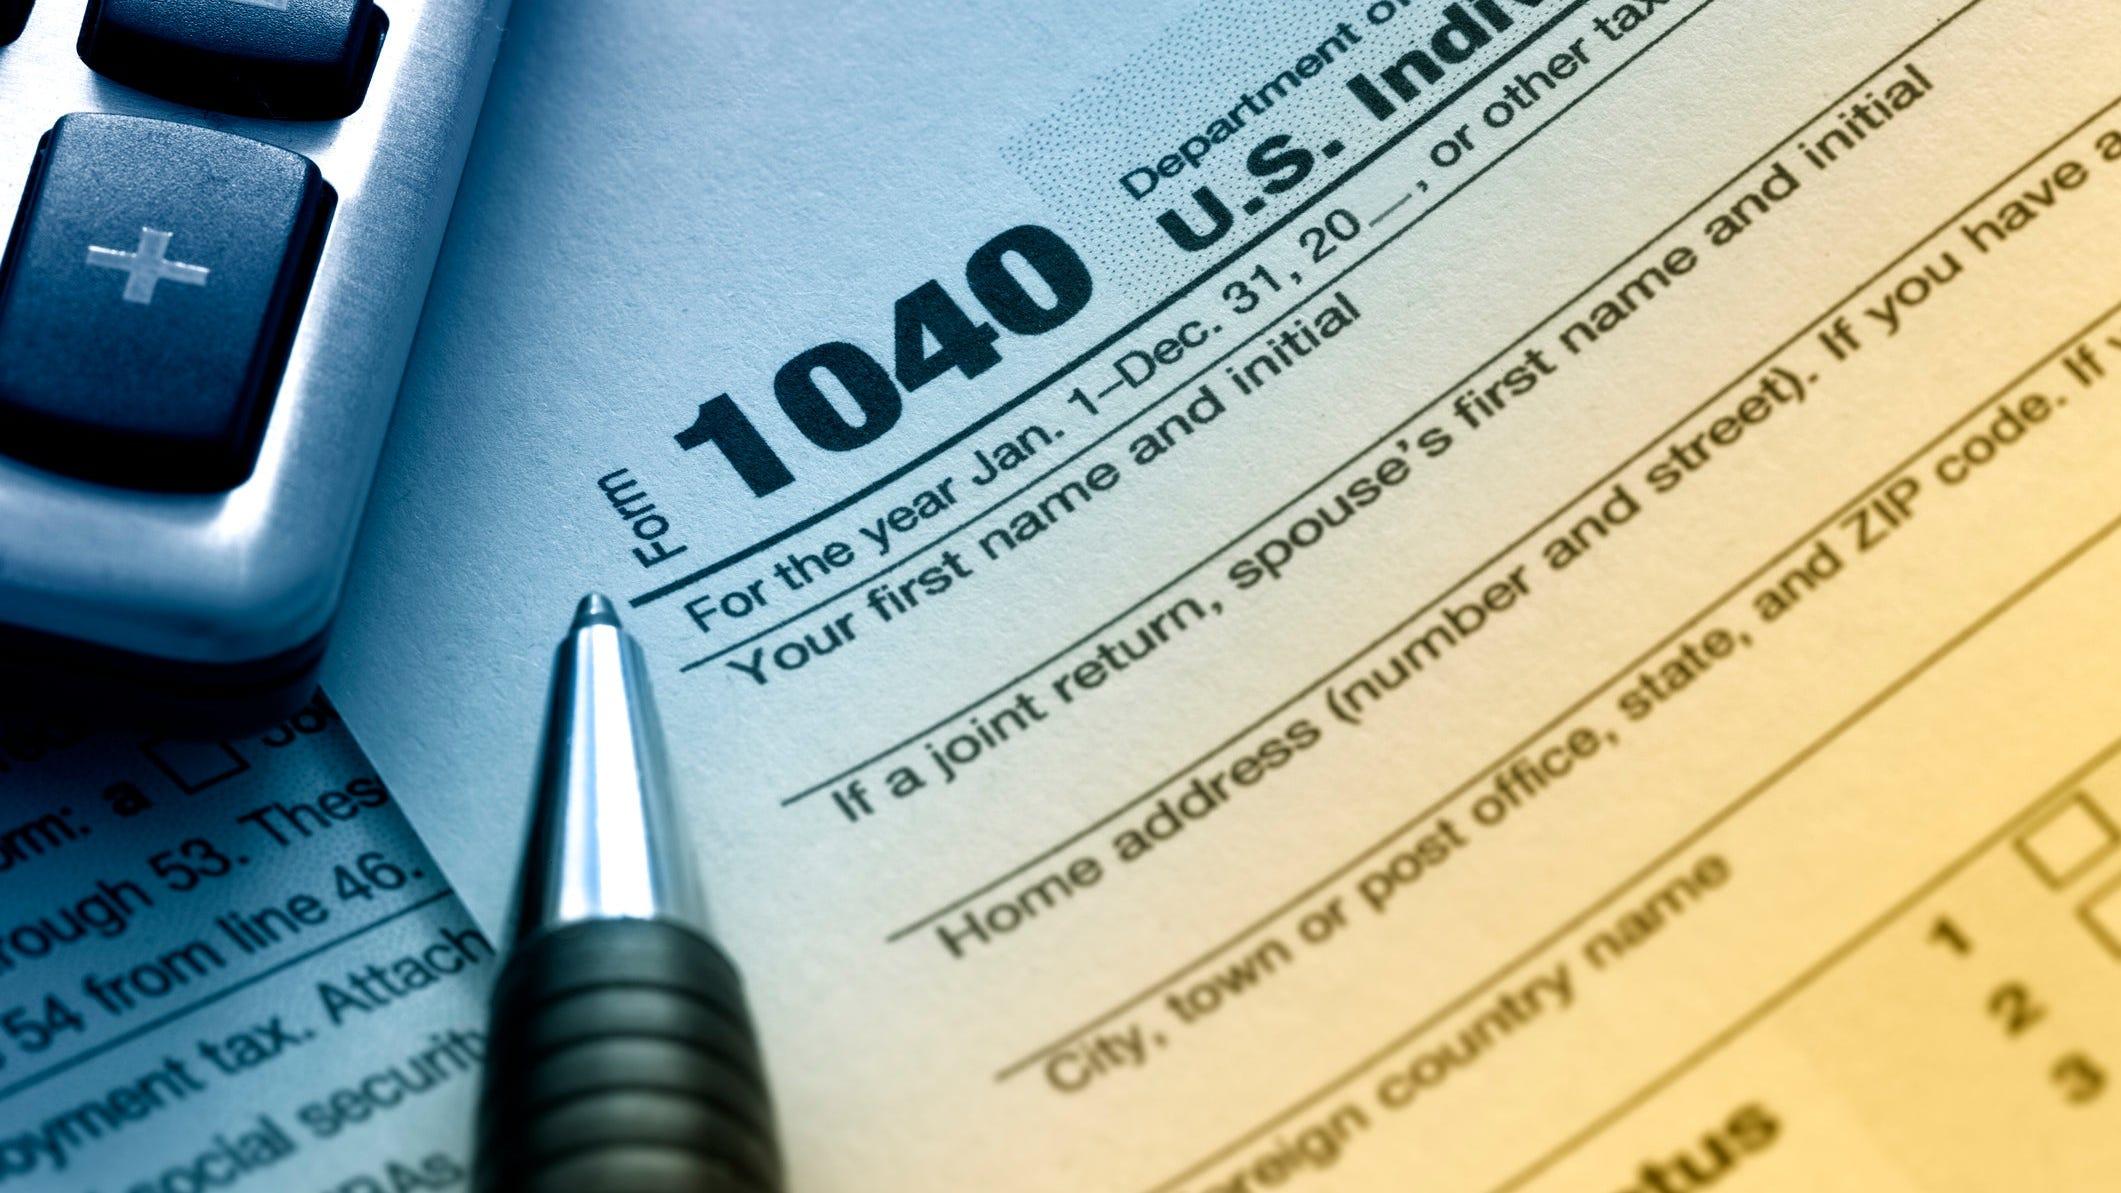 Taxes 2020 Irs Says It Will Accept Tax Returns Starting Jan 27